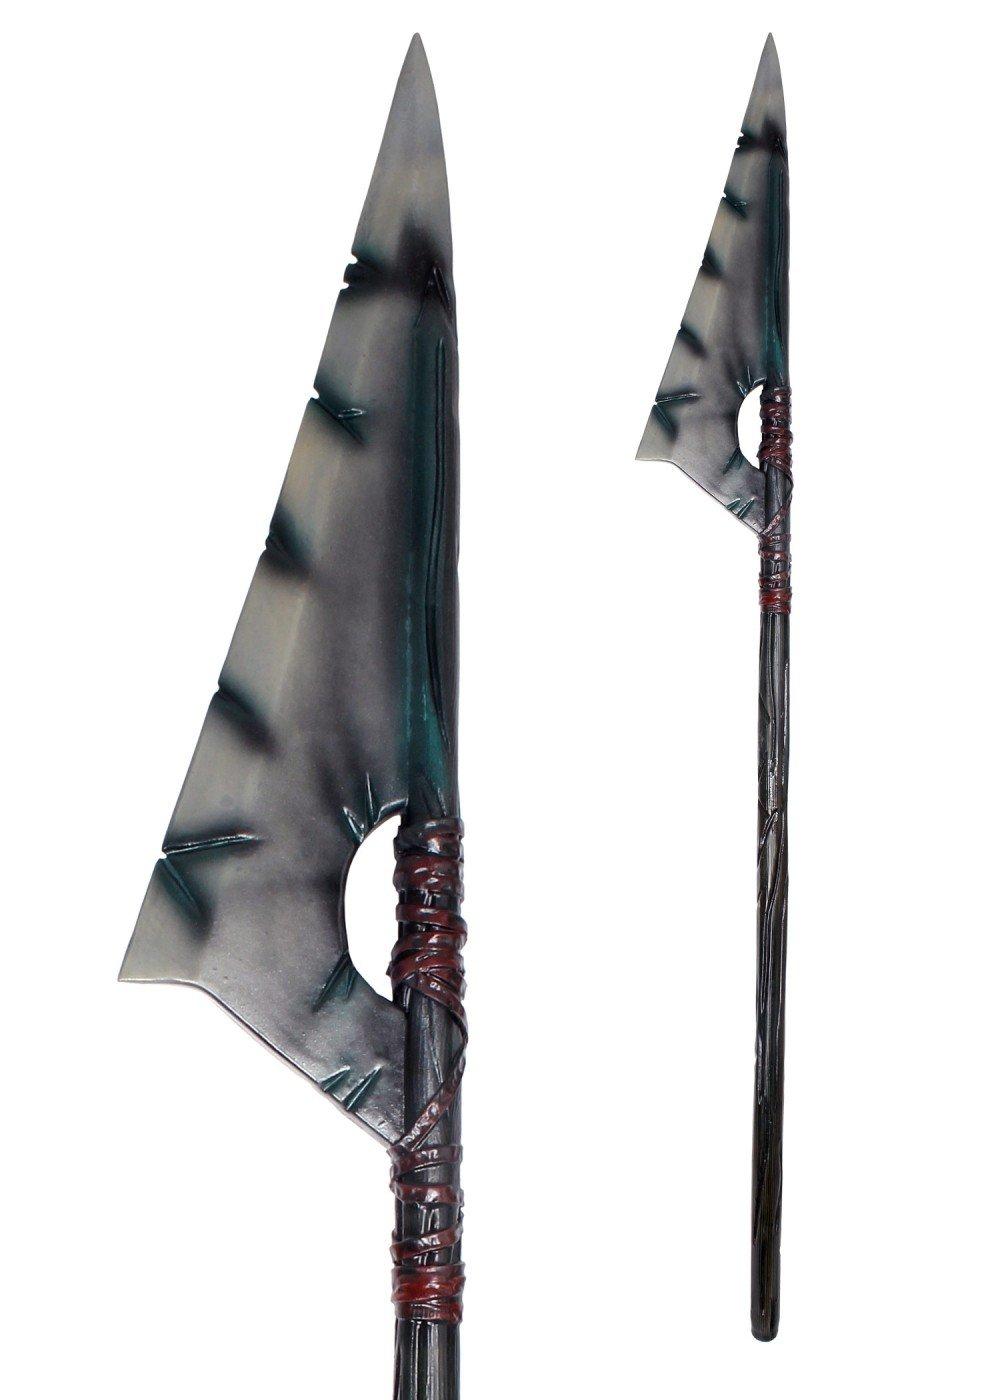 LARP Ork-Lanze ca. 190 cm aus Schaumstoff Polsterwaffe Fantasy Krieger Hexer Speer Mittelalter Schaukampf Wikinger